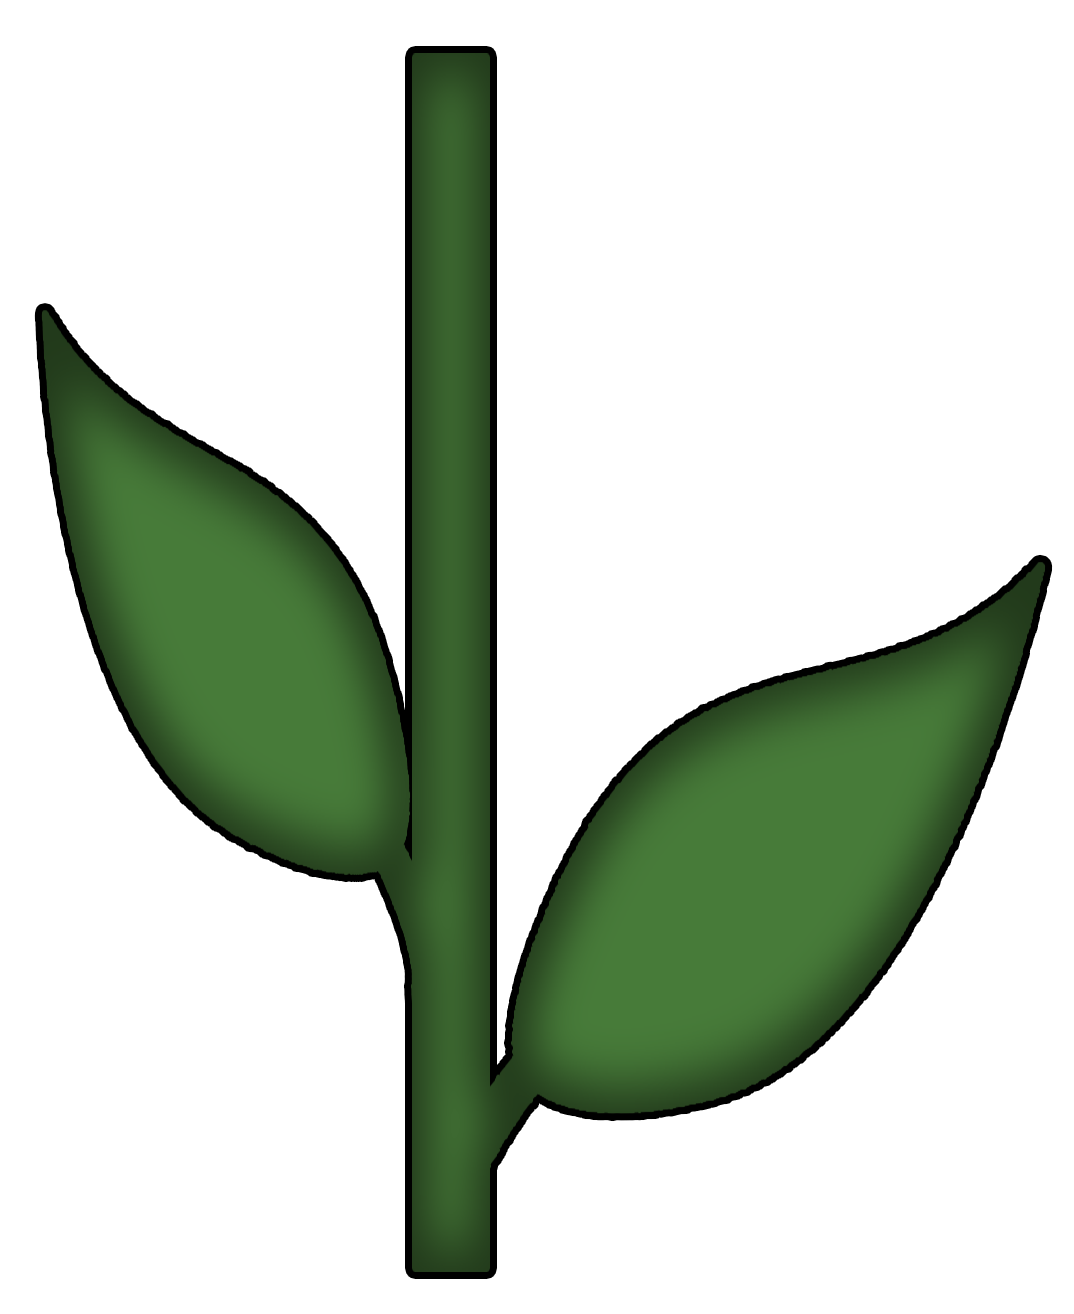 1074x1314 Plant Stem Flower Petal Shrub Clip Art